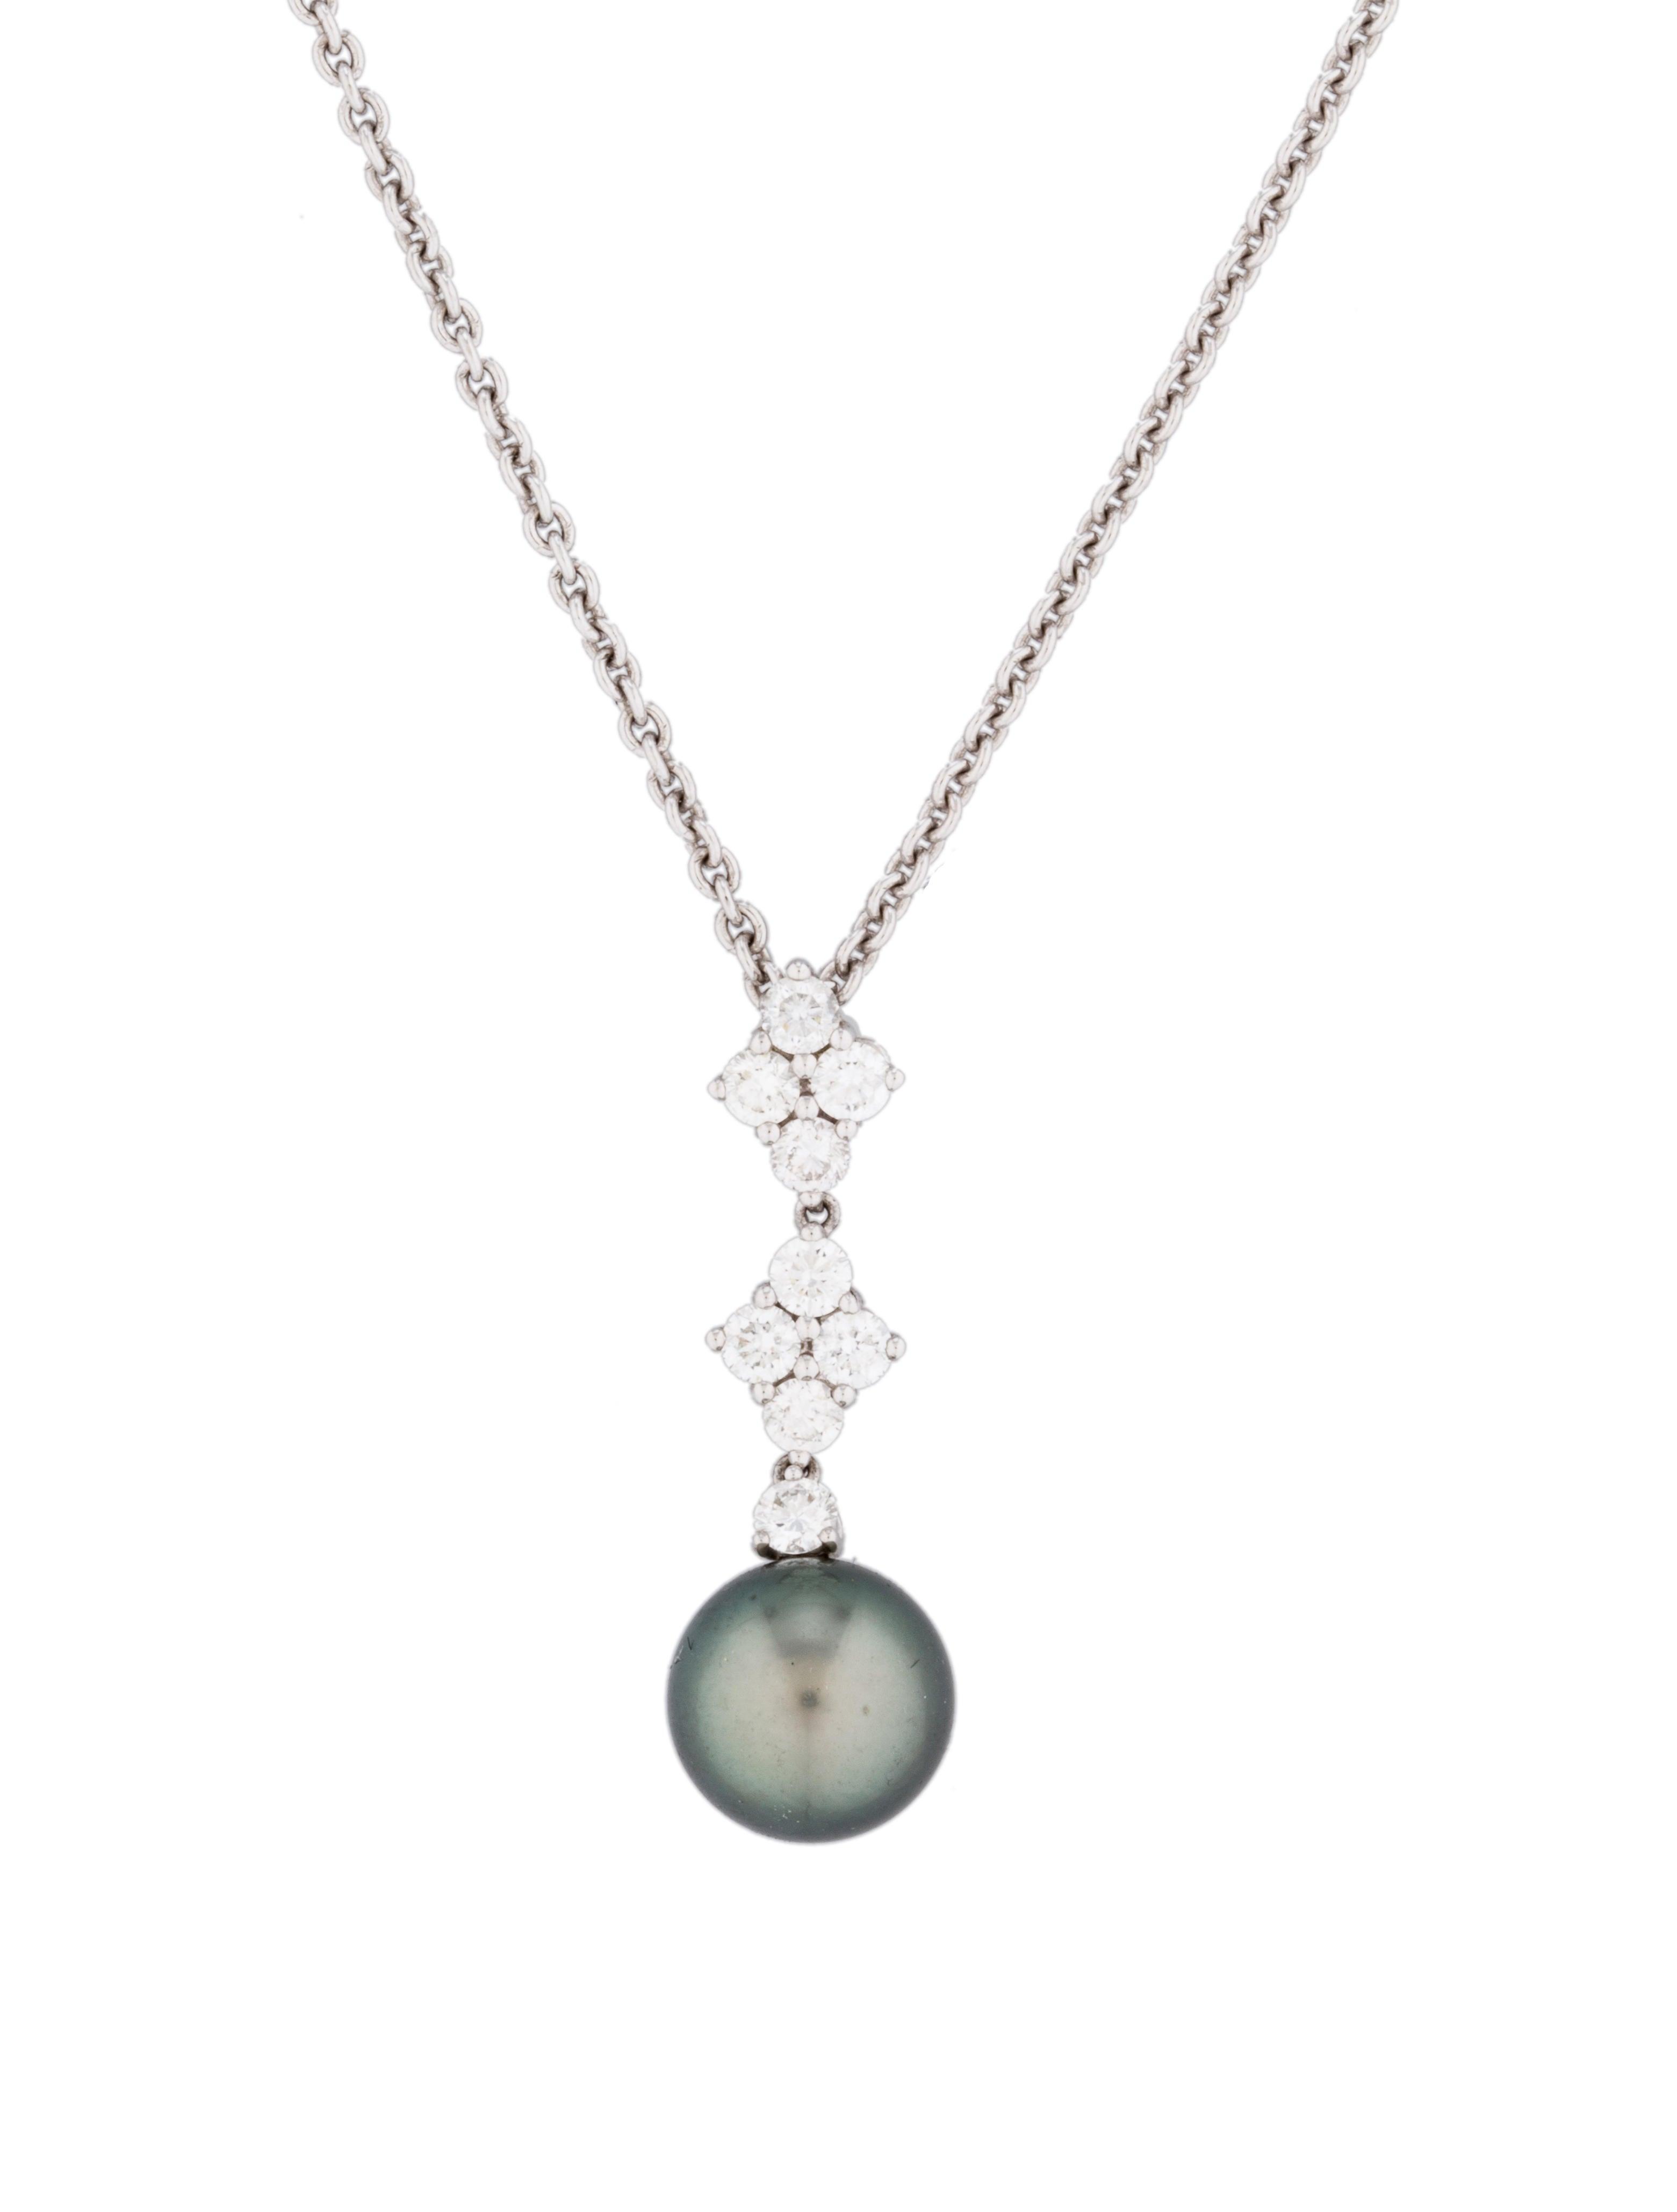 South Sea Pearl & Diamond Pendant Necklace